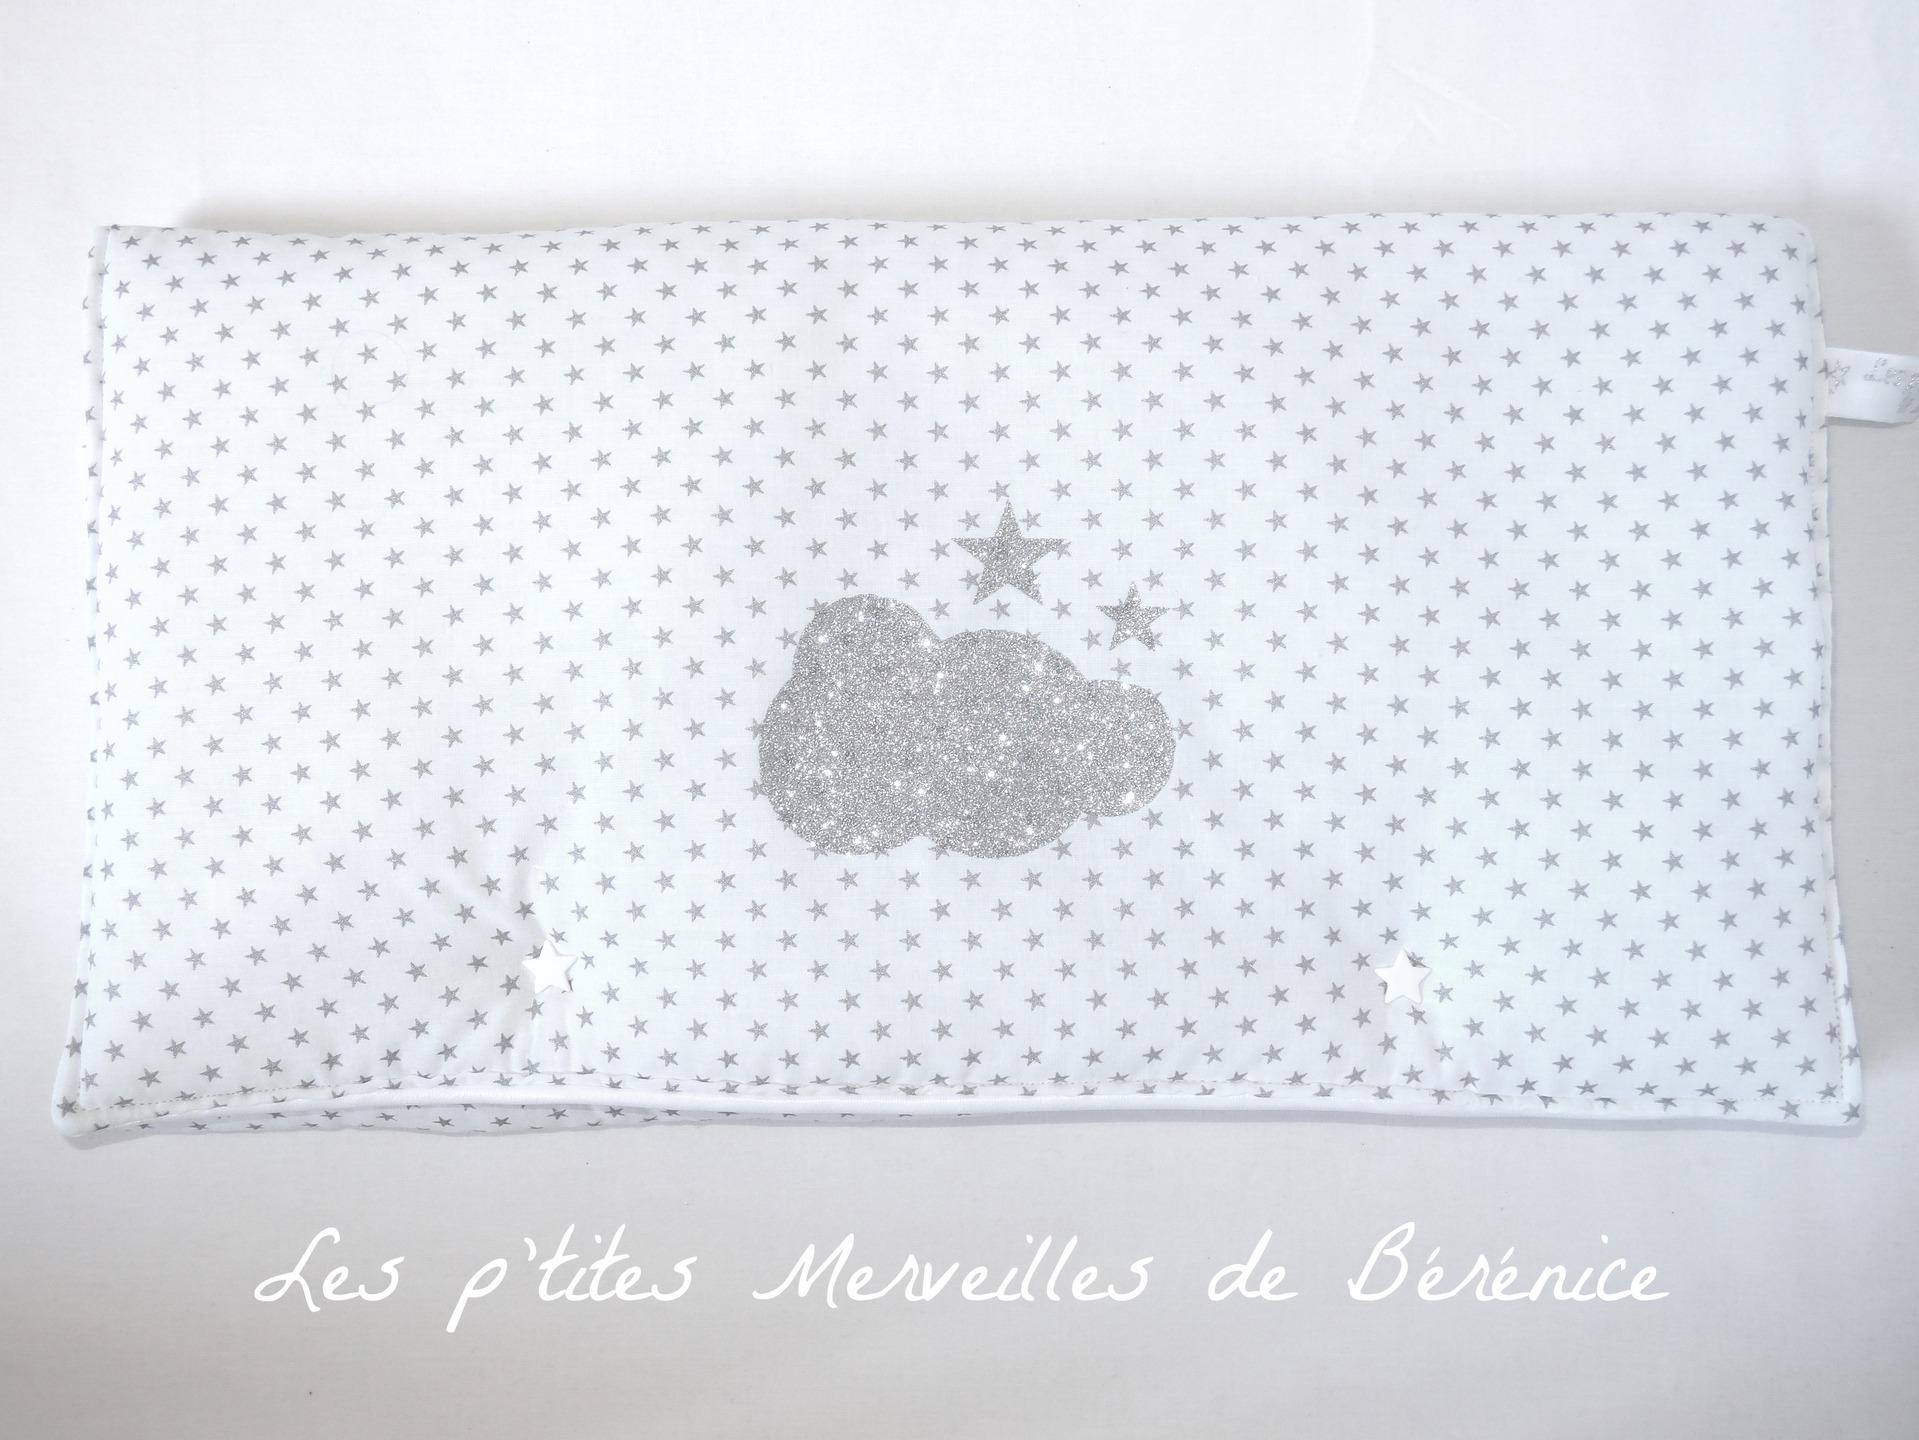 tapis langer nomade molletonn nuage toiles les p 39 tites merveilles de b r nice. Black Bedroom Furniture Sets. Home Design Ideas